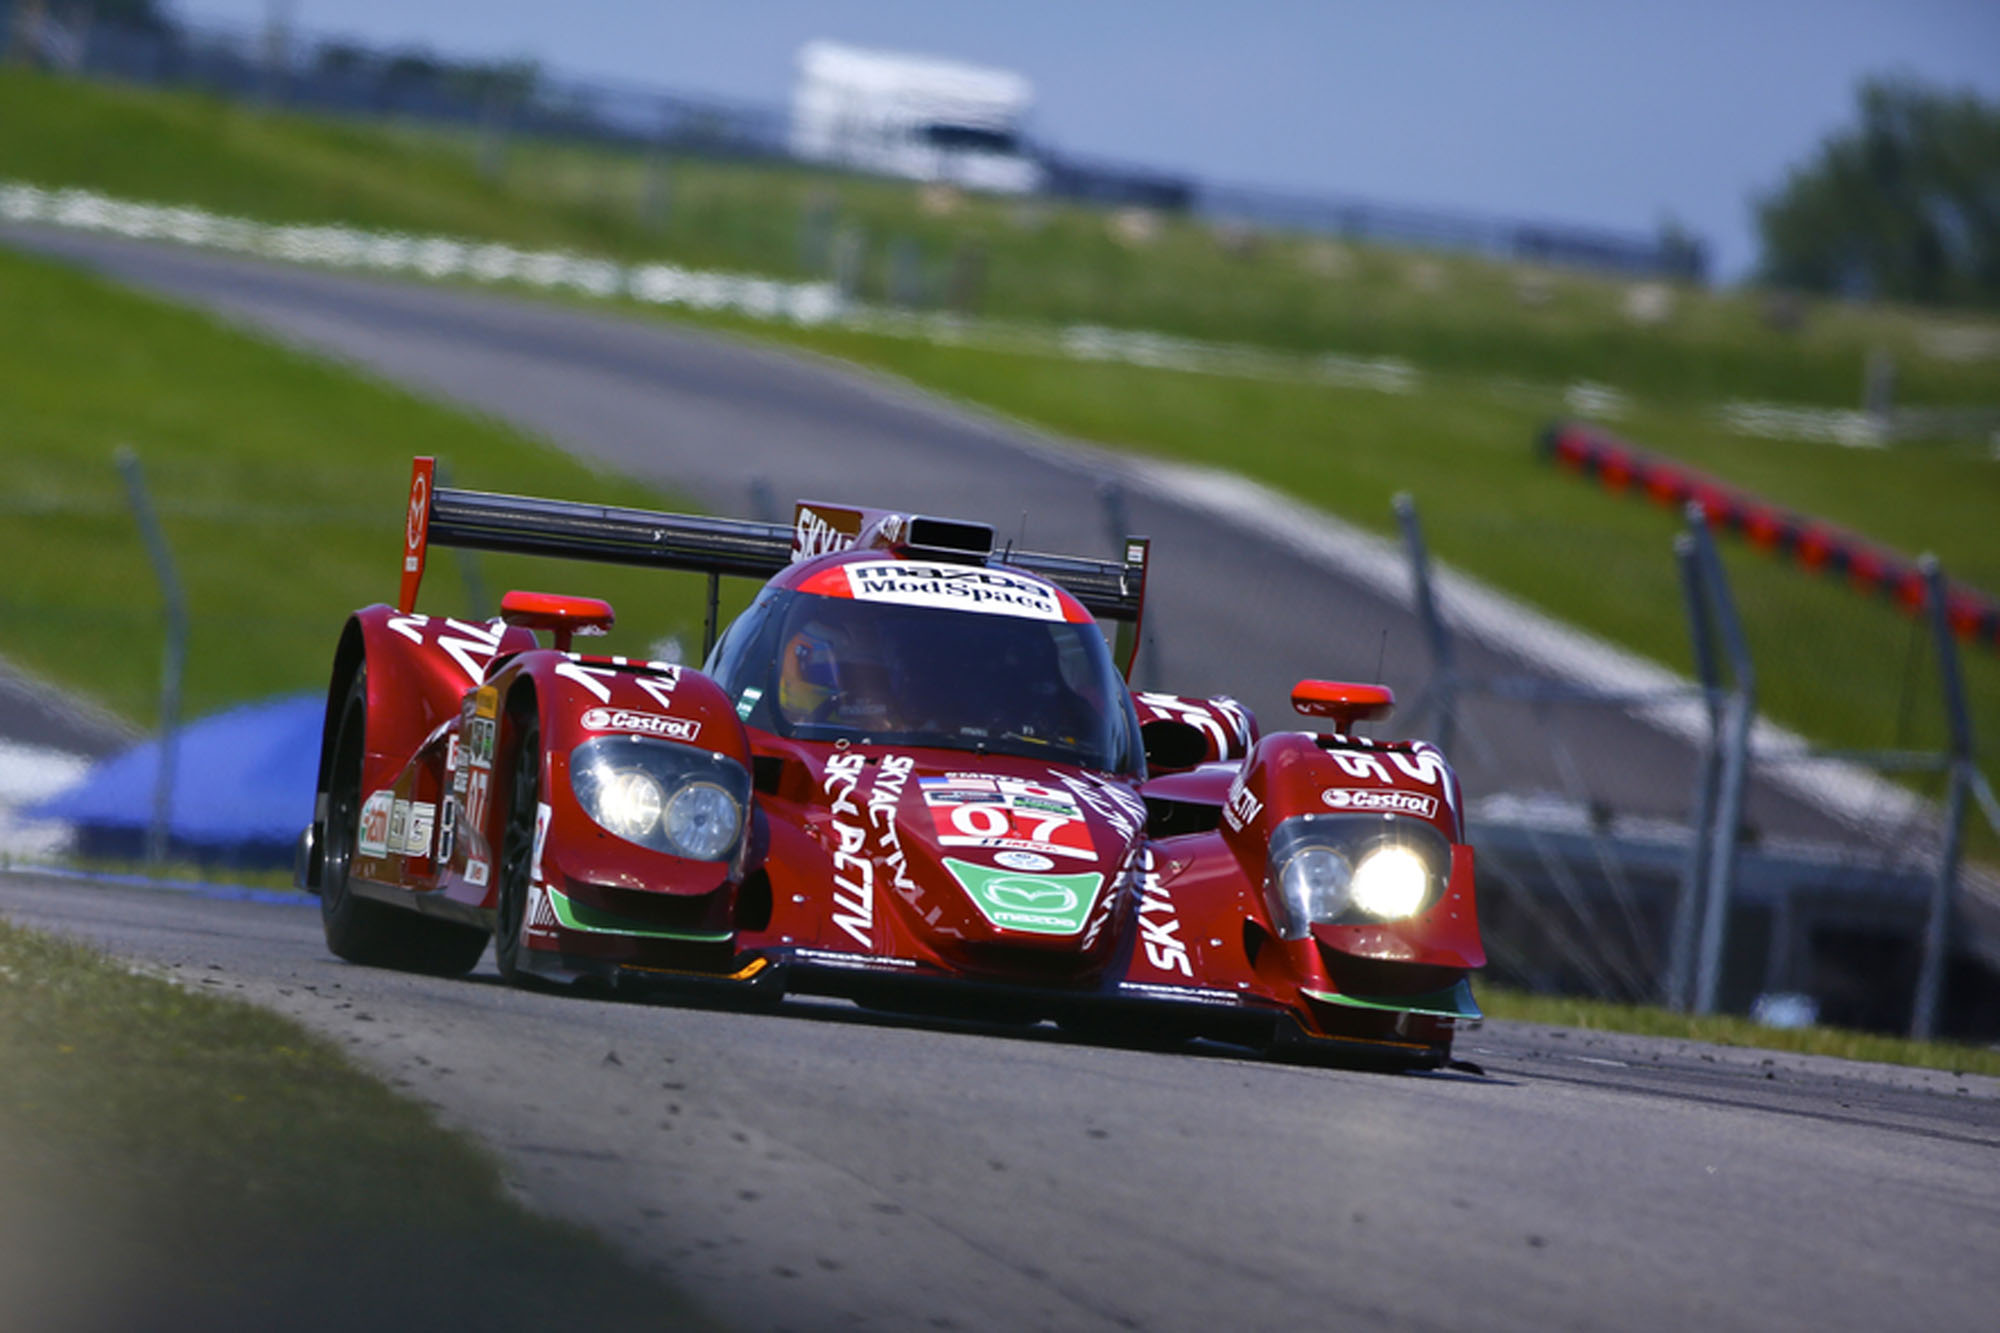 R-Motorsport gunning for B12H victory in Aston send-off